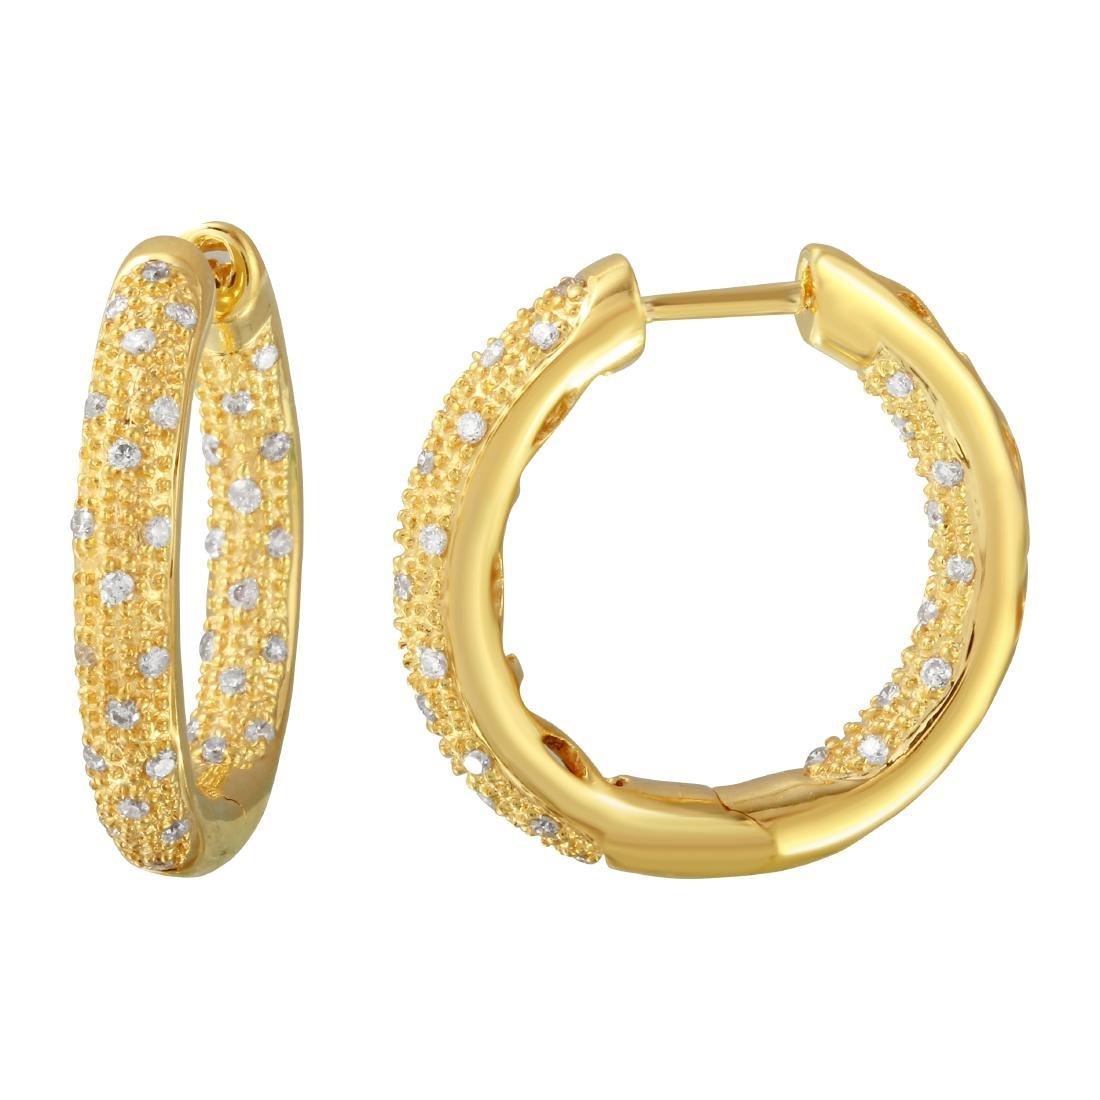 Genuine 0.46 TCW 14K Yellow Gold Ladies Earring -